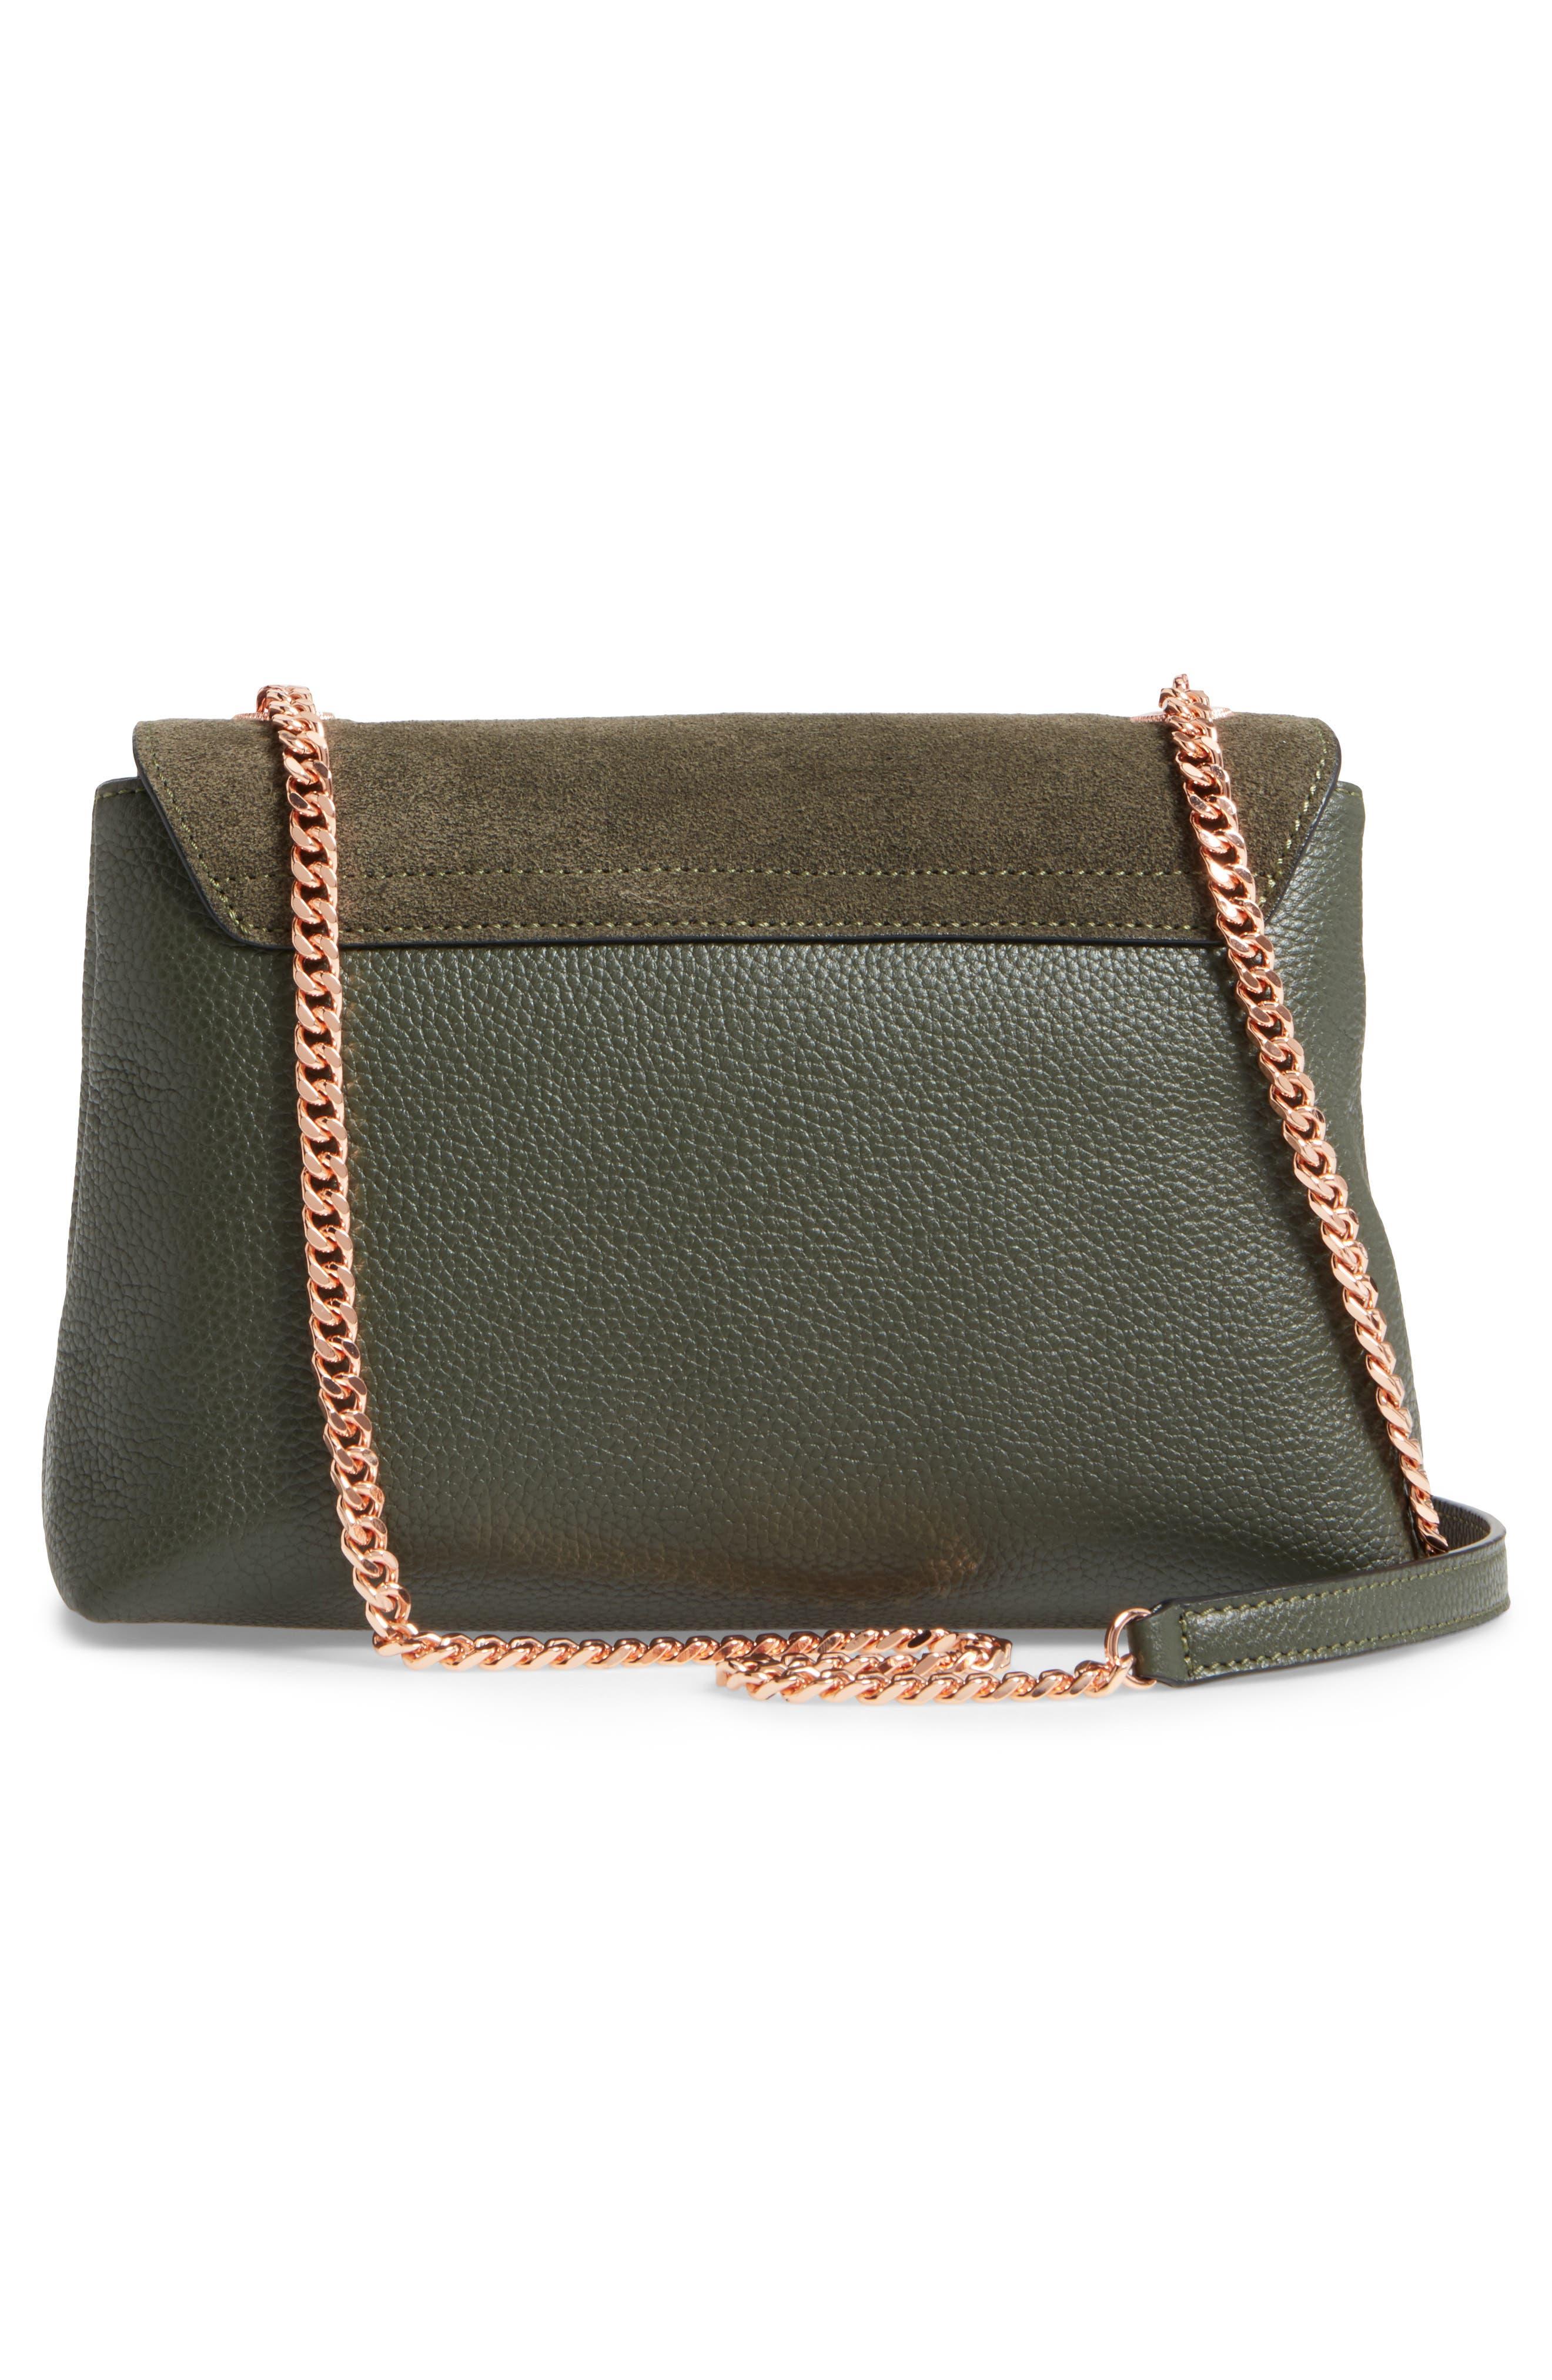 Sorikai Leather & Suede Crossbody Bag,                             Alternate thumbnail 3, color,                             312